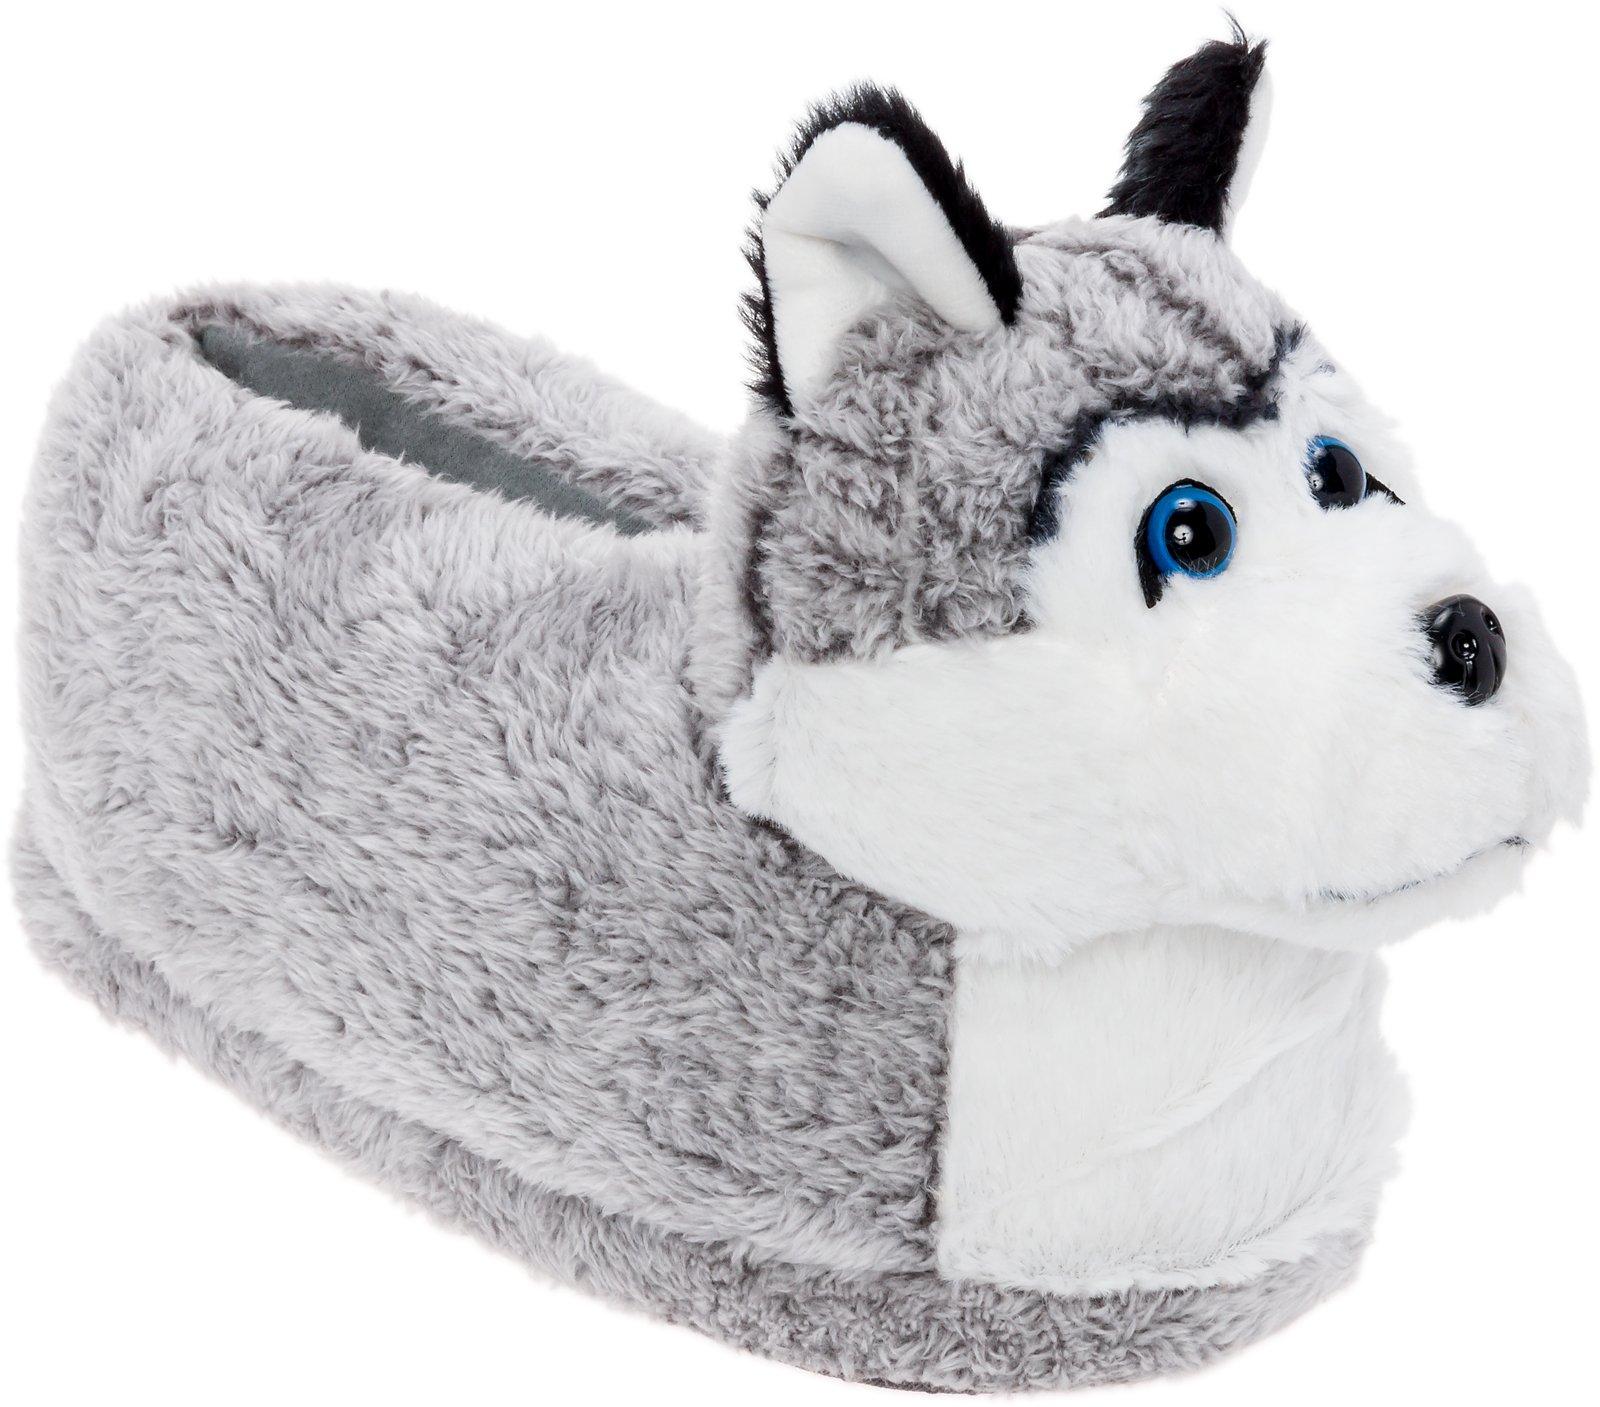 Silver Lilly Siberian Husky Slippers - Plush Dog Slippers w/Platform by (Grey/White/Black, Medium)